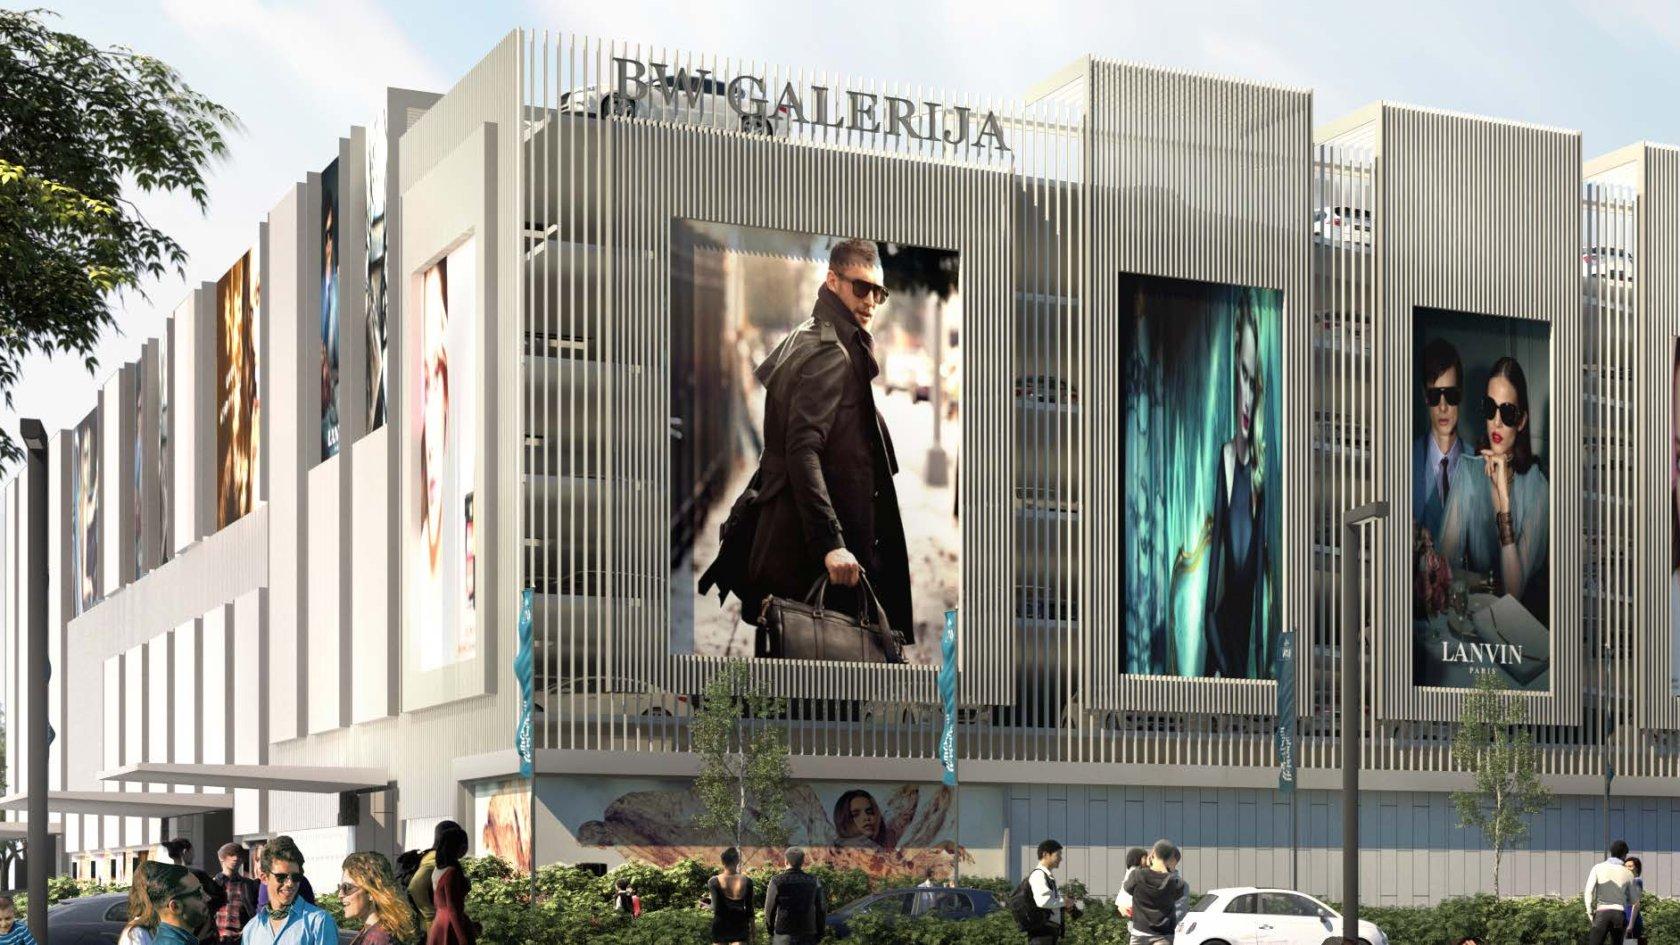 Bates Belgrade Waterfront Galerija Mall